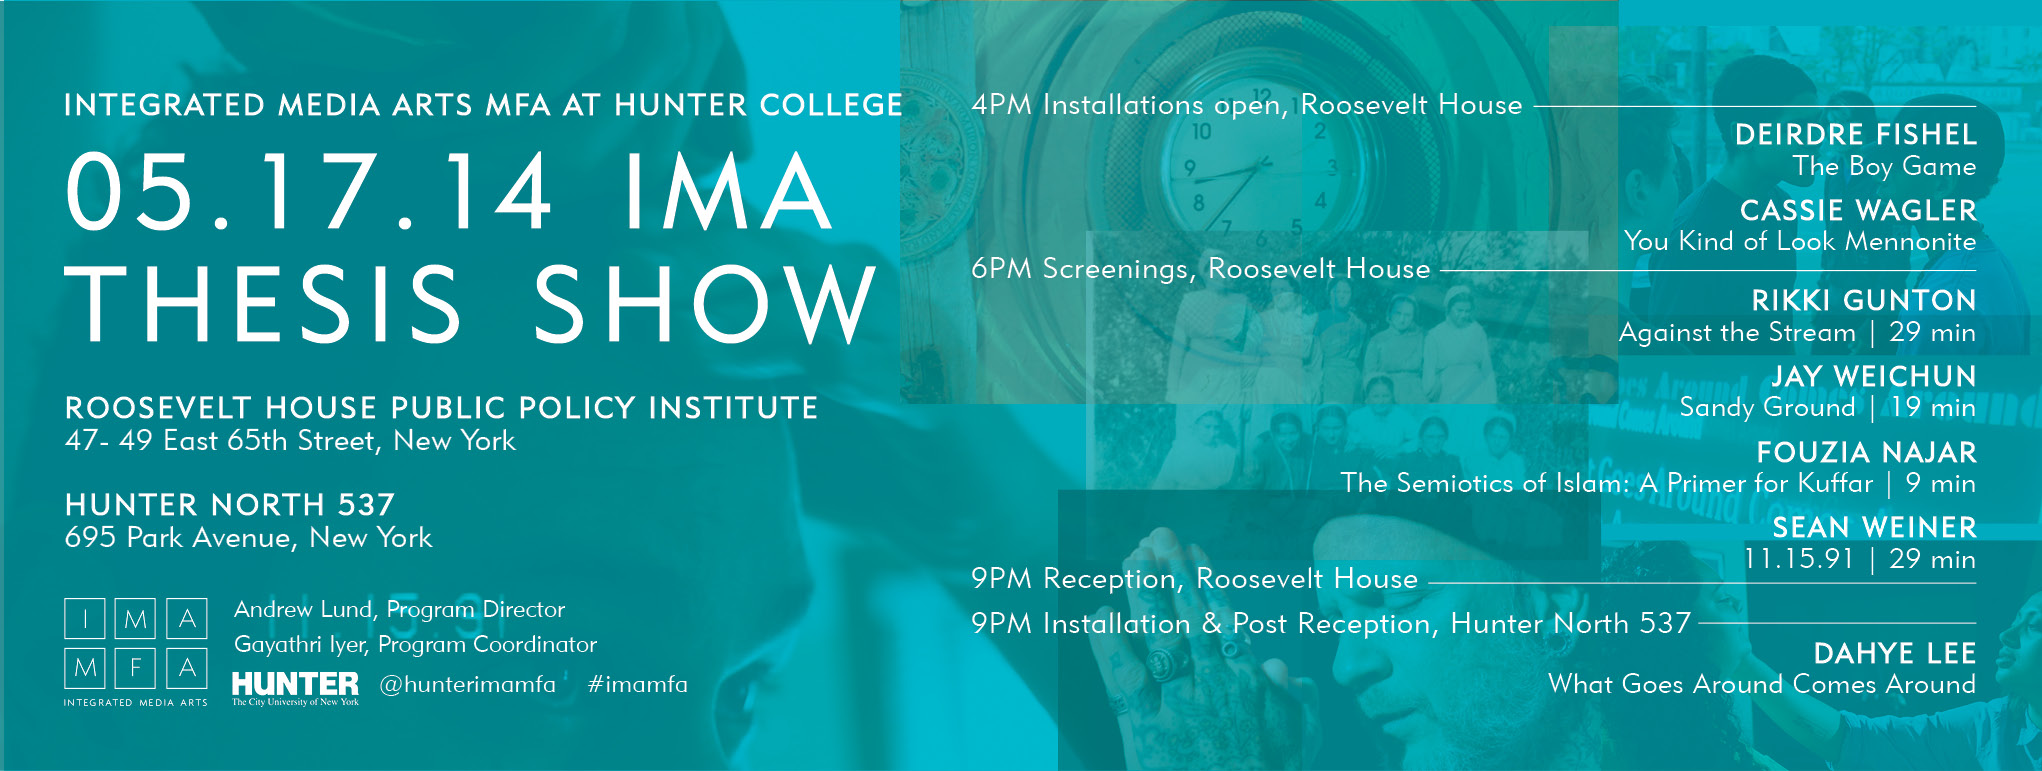 IMA Thesis Show Flyer